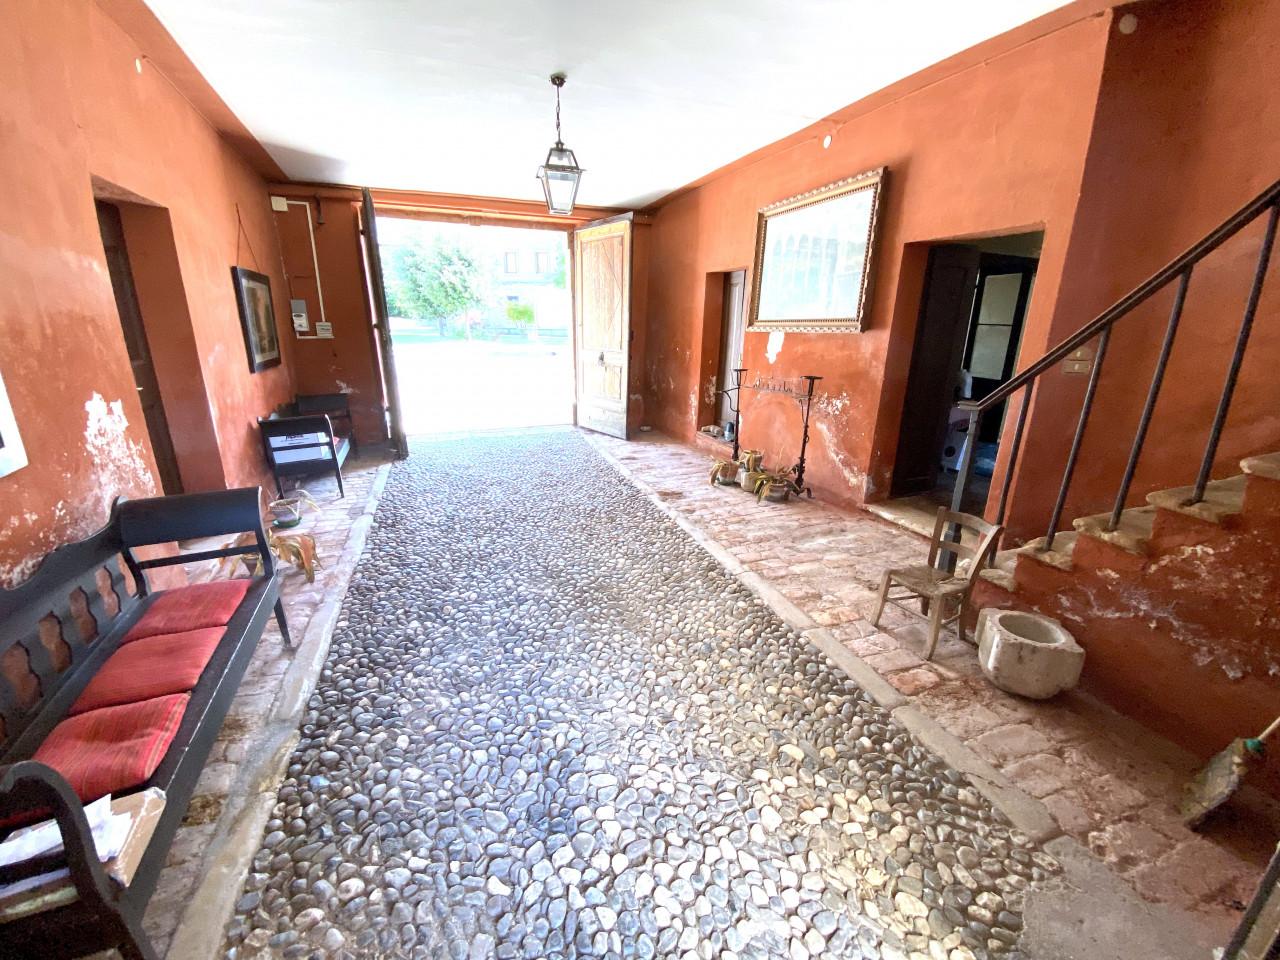 Dimora Storica in vendita in Centro a Valvasone - Rif.P1 https://images.gestionaleimmobiliare.it/foto/annunci/200820/2282895/1280x1280/004__img_3557.jpg